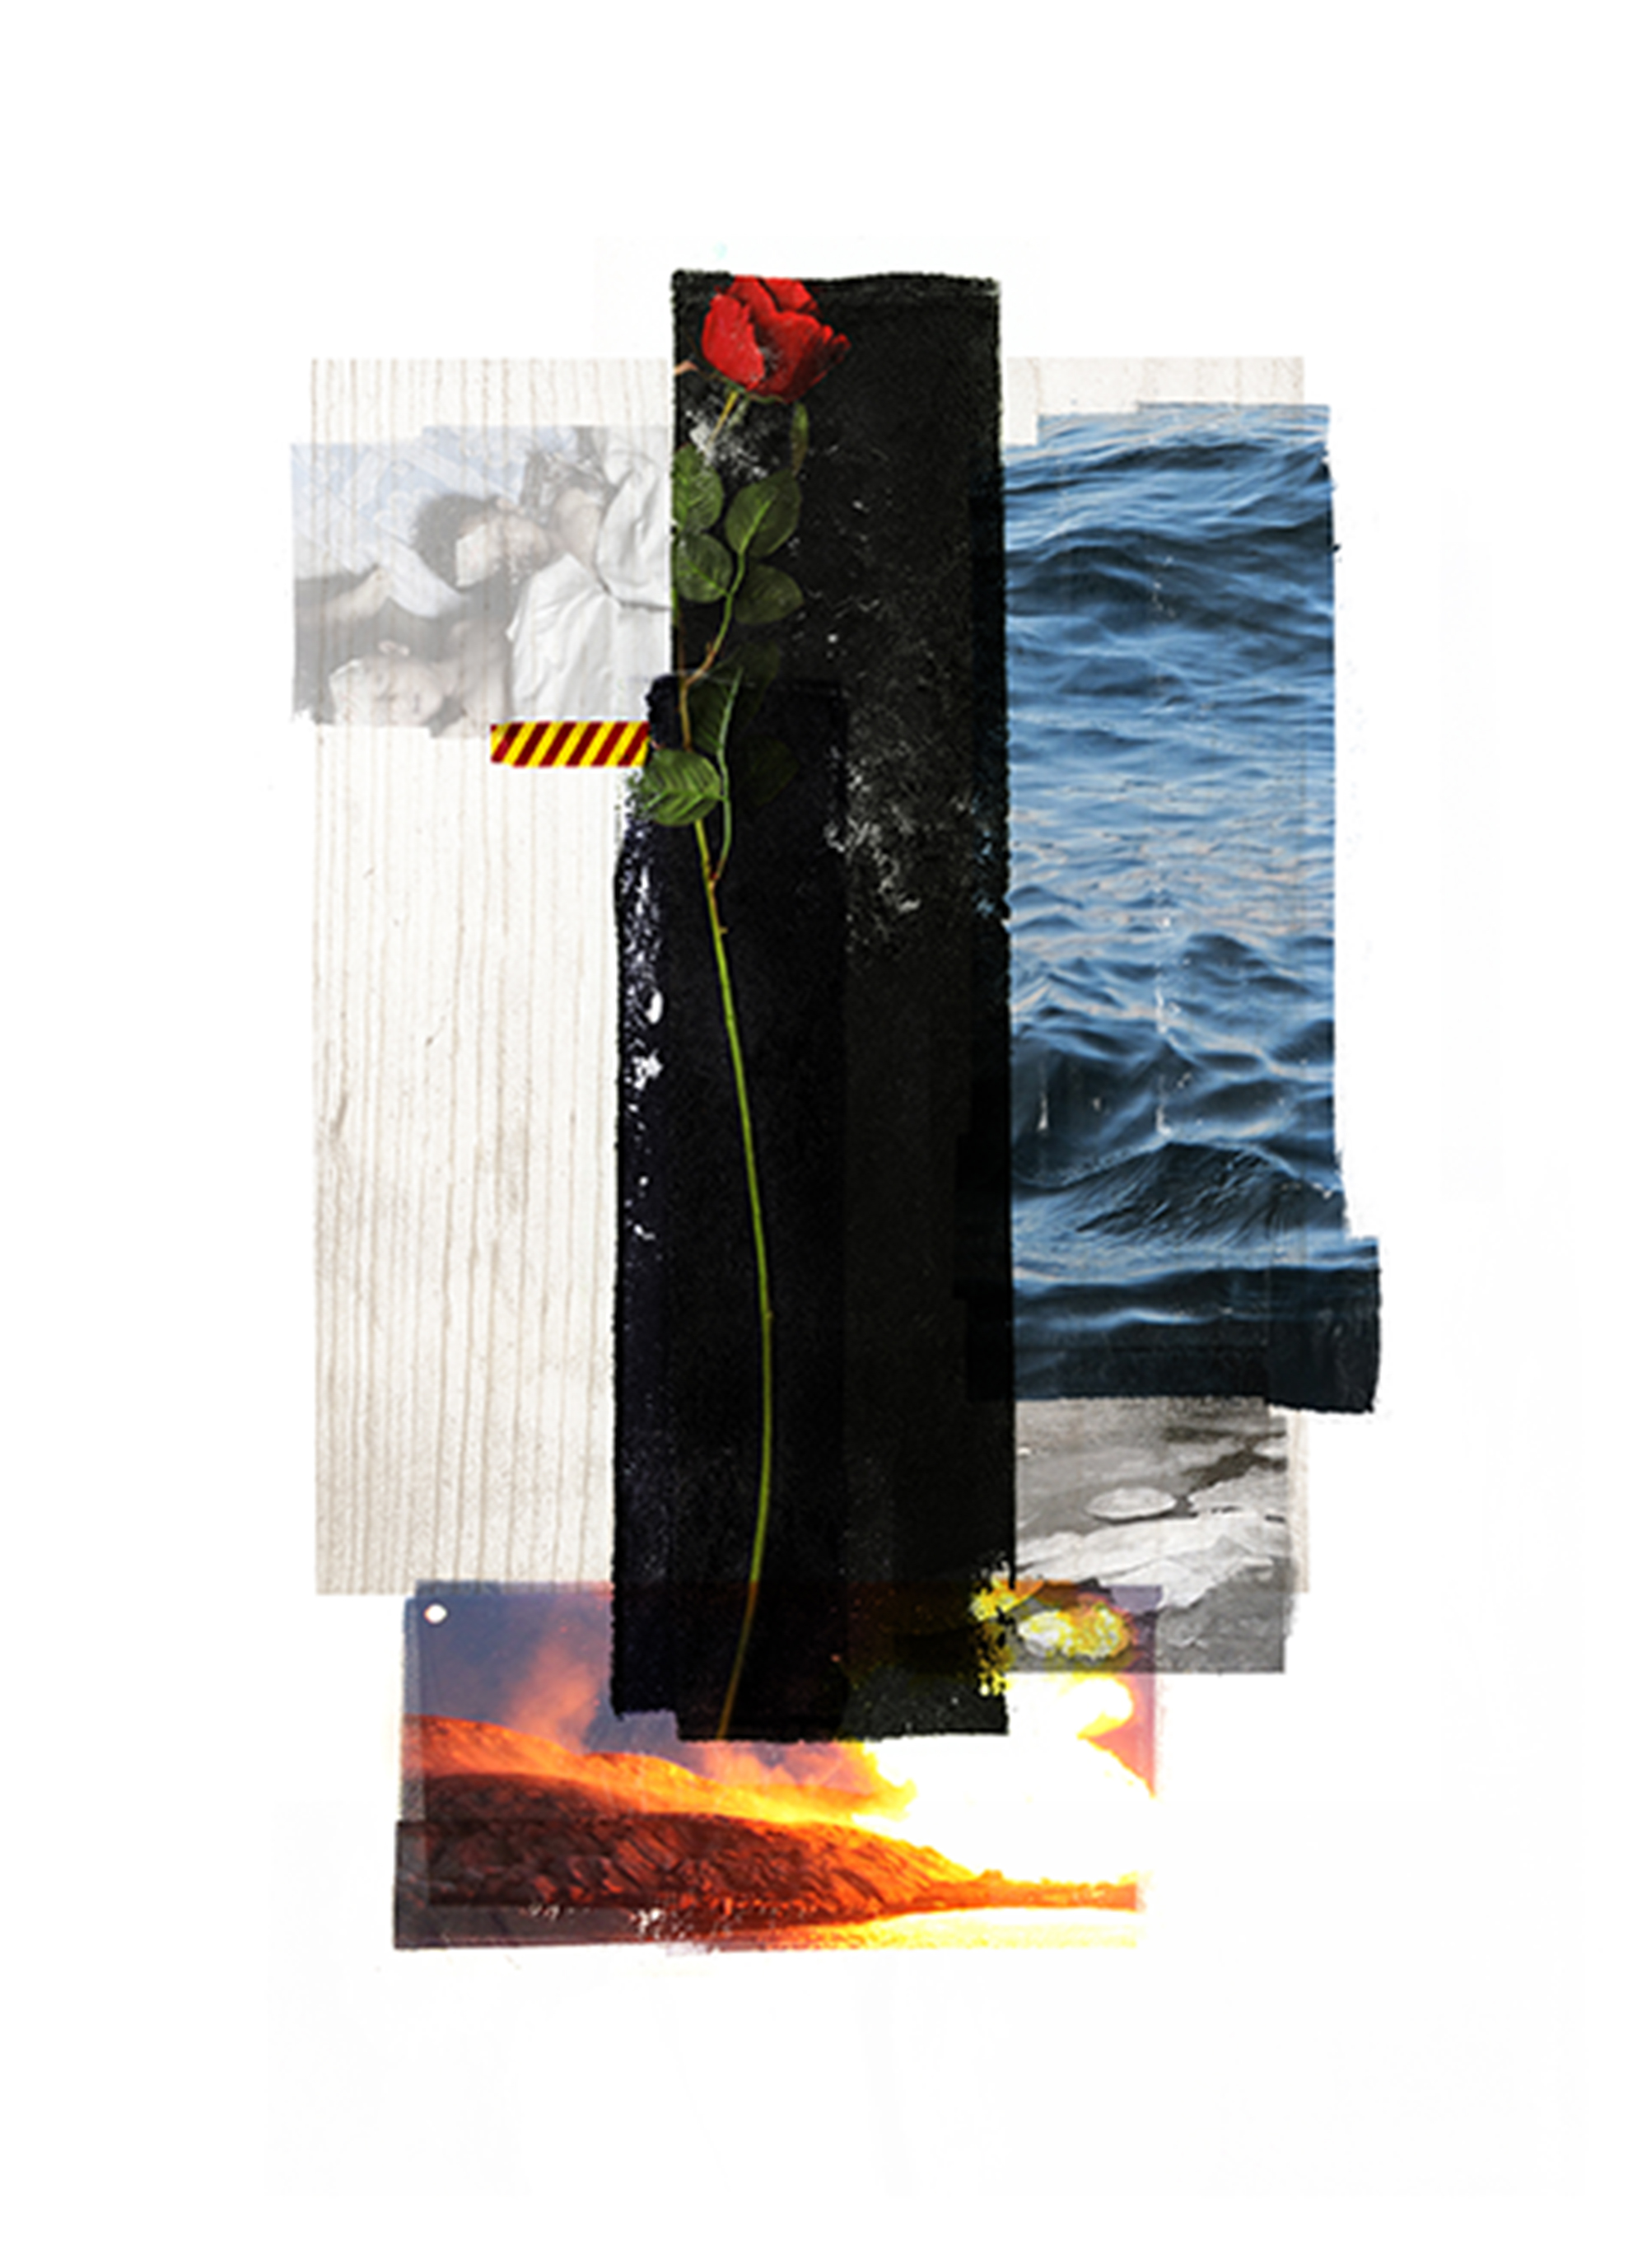 Rose / Wave / Study  Original Archival UV Pigment Print / BFK Rives 250 gr 18 x 25 cm / 7 x 9,8 in Edition of 50 + 7 Ap Editeur: Per Fronth Studios / Printer Henrik Aunevik  14/2015: